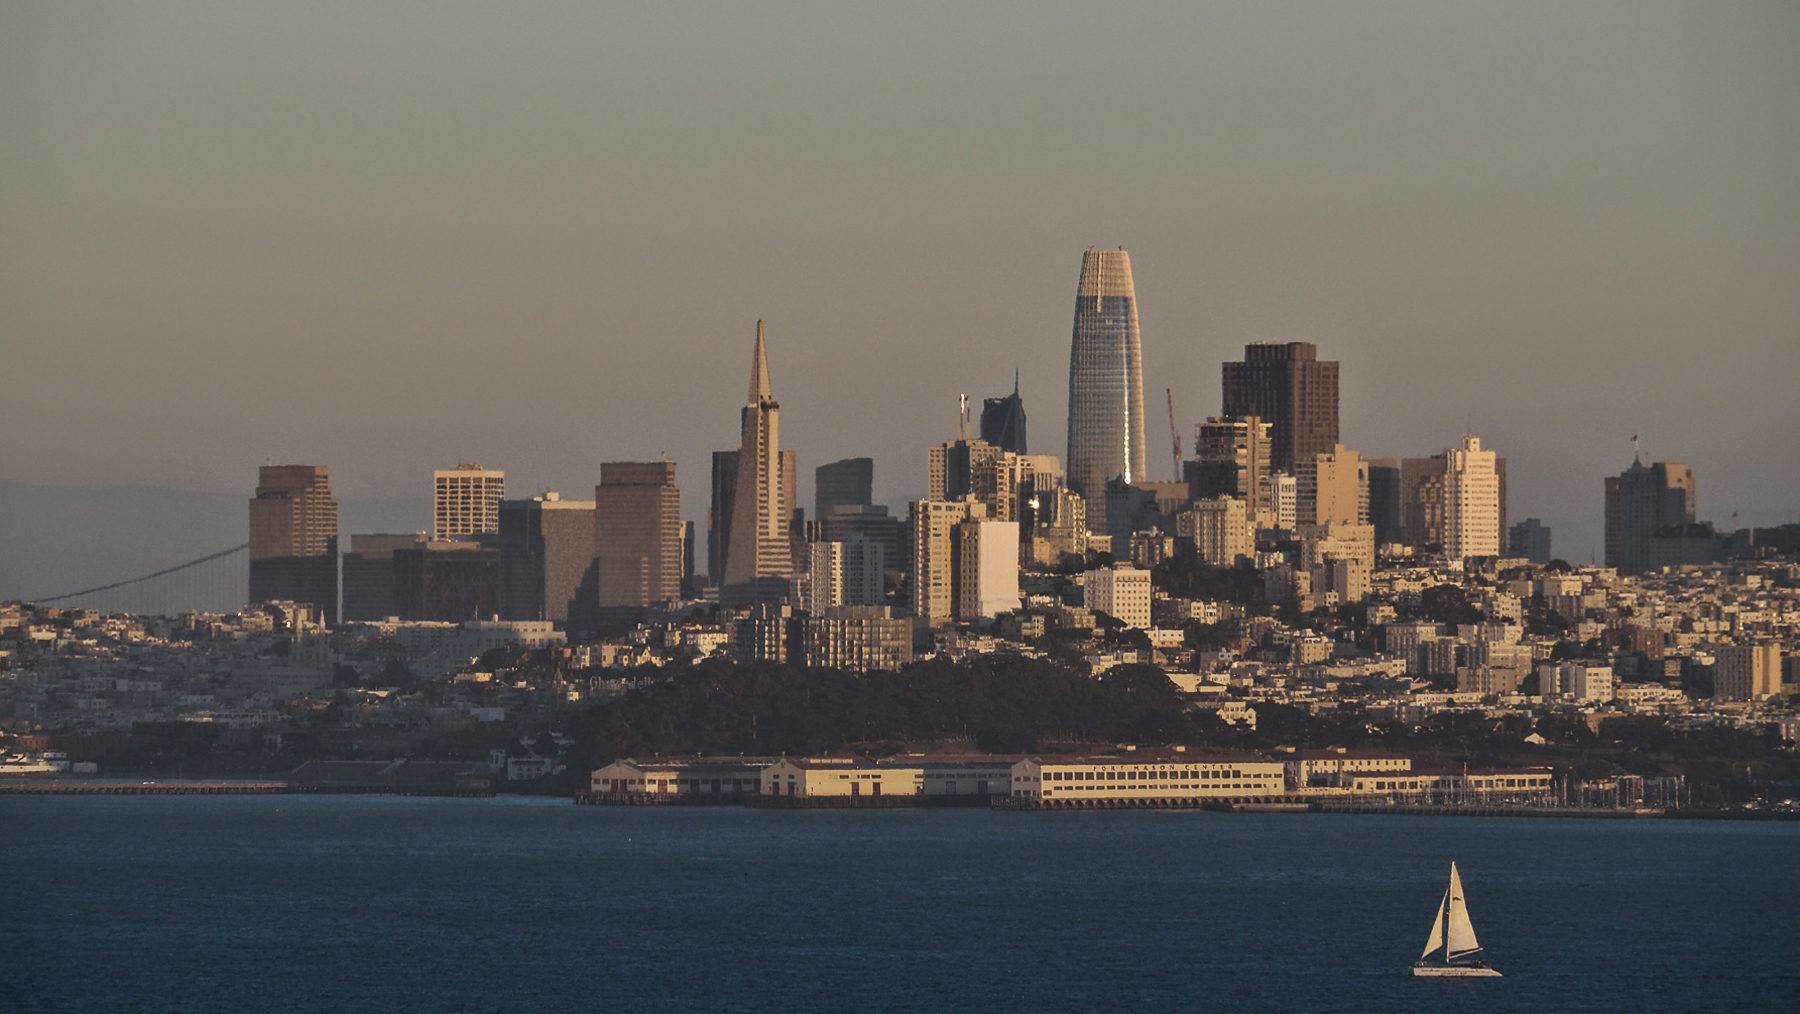 San Franzisco Skyline